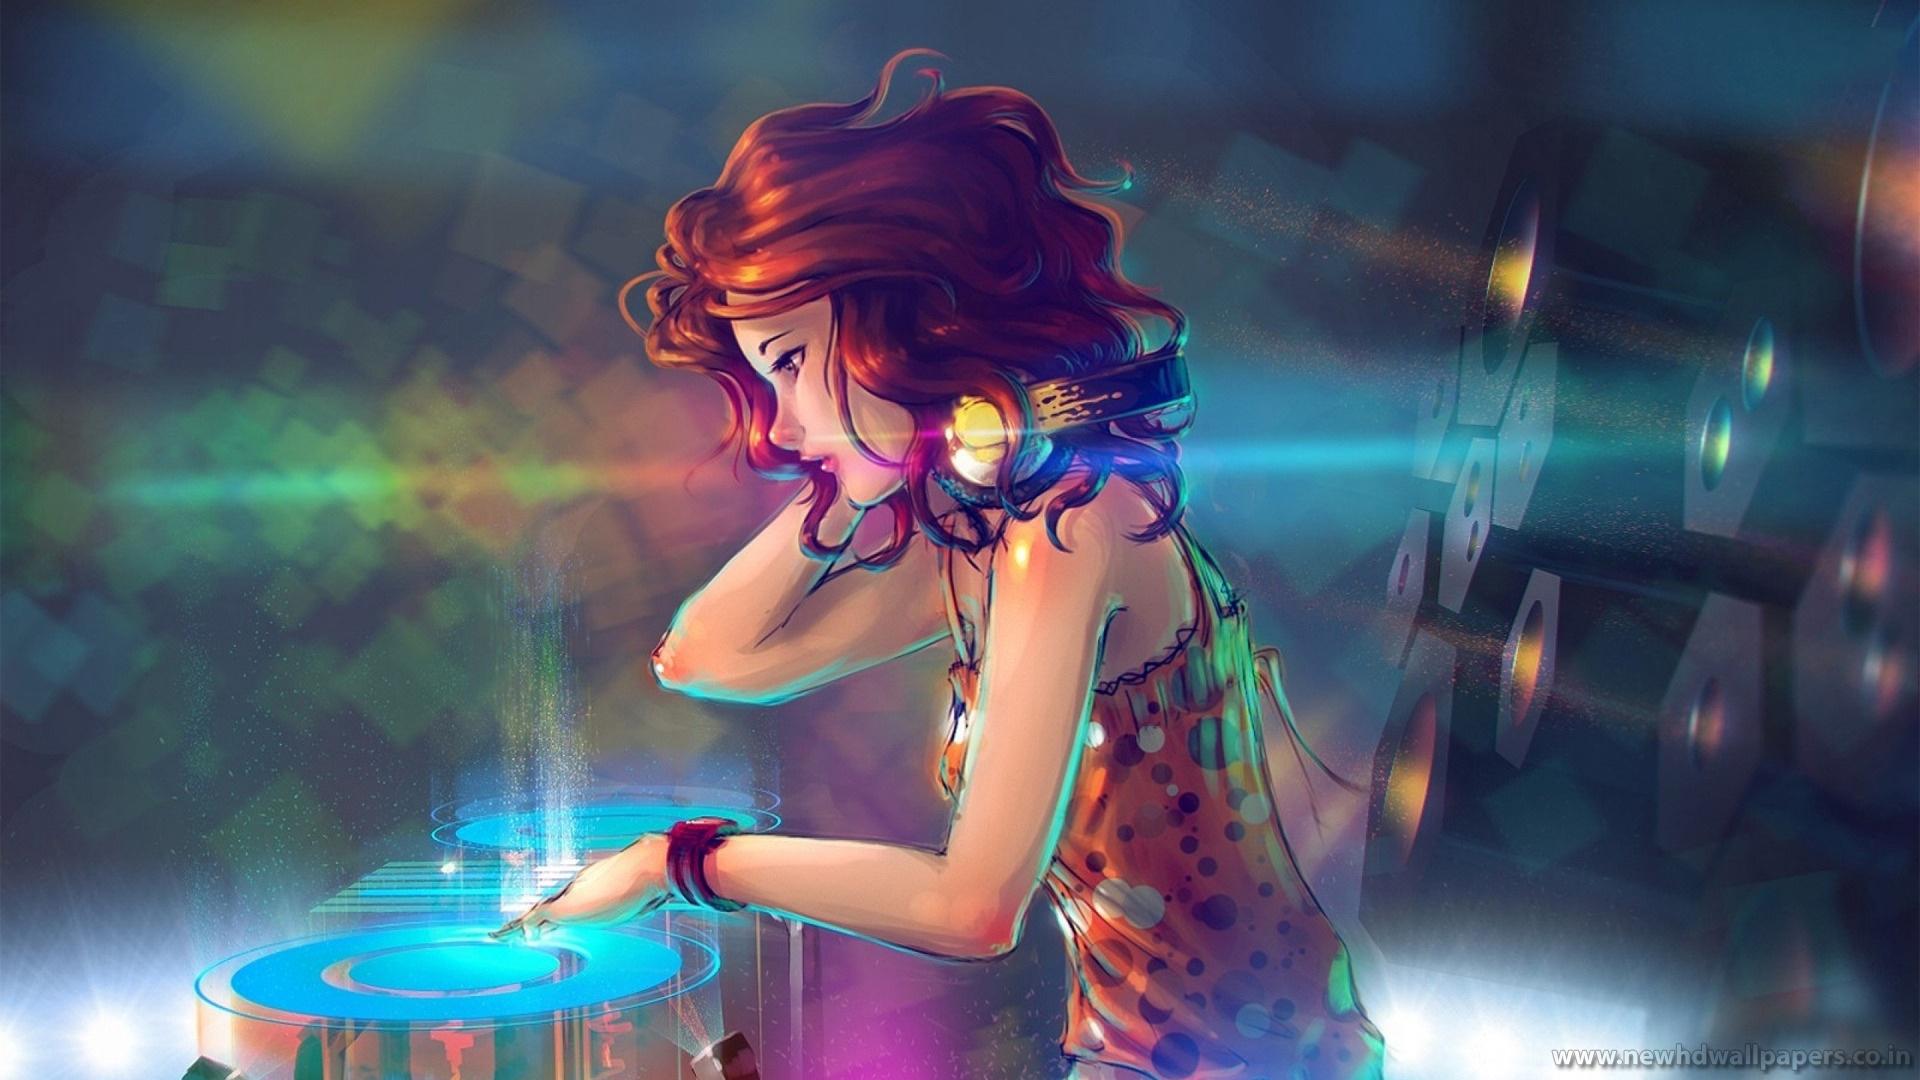 Girl DJ Background wallpaper Girl DJ Background hd wallpaper 1920x1080